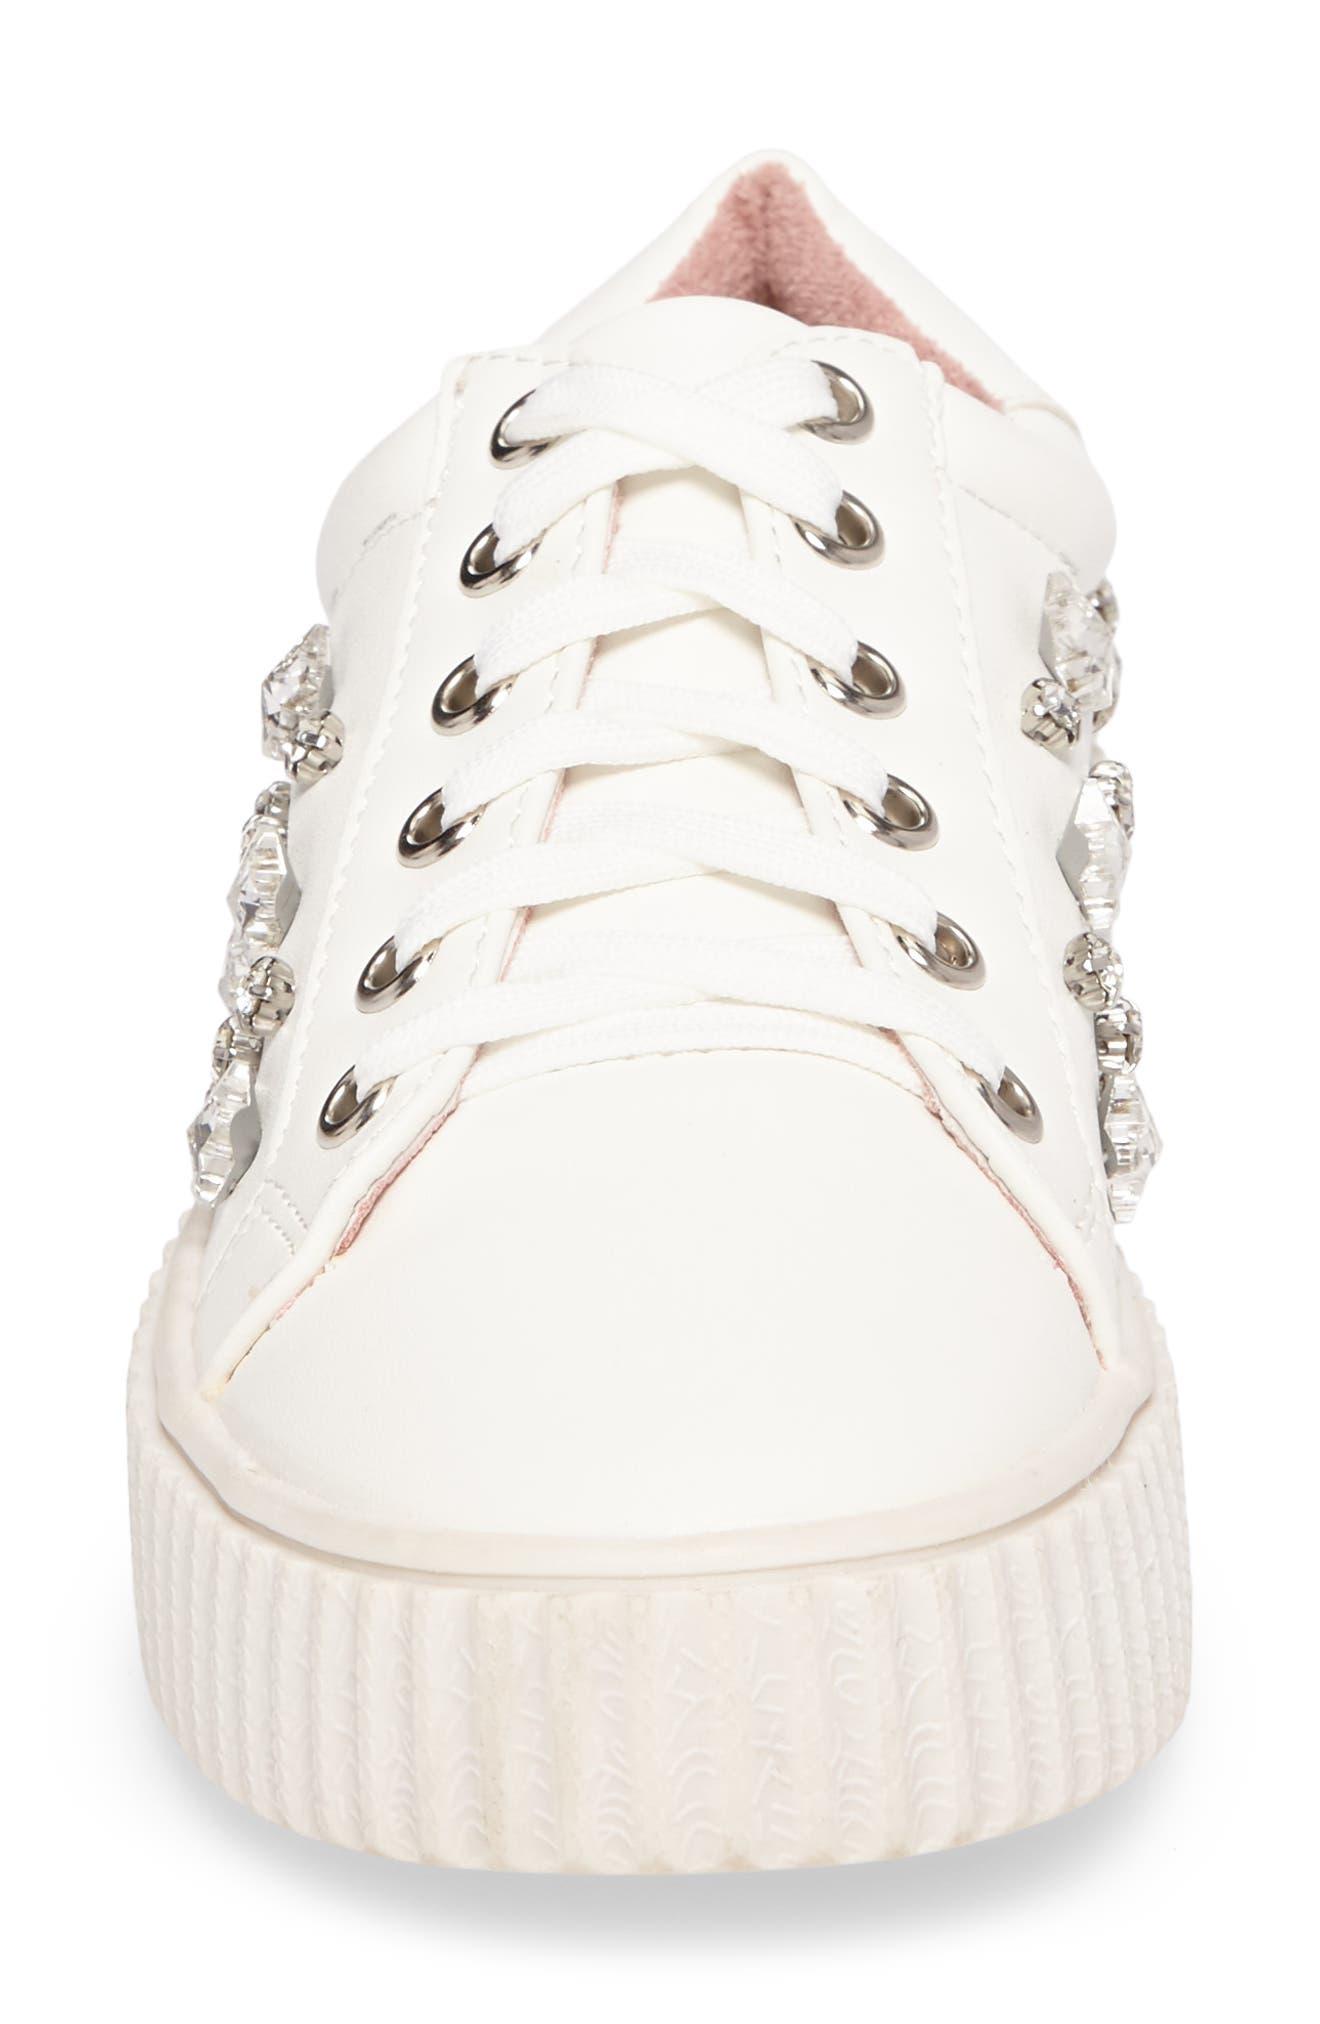 Pam Embellished Platform Sneaker,                             Alternate thumbnail 4, color,                             White